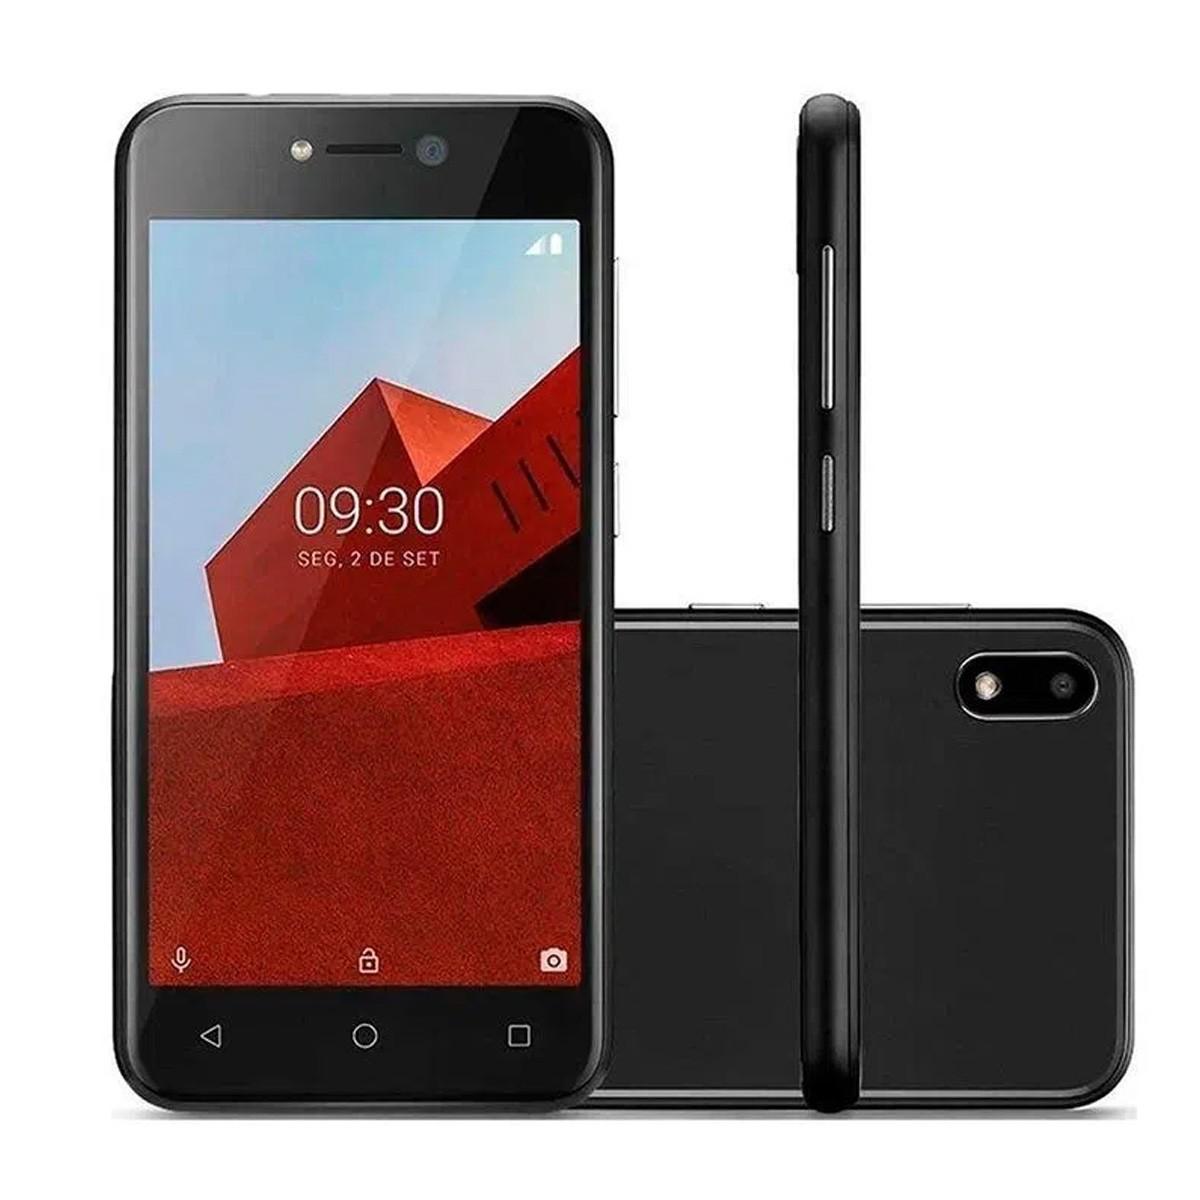 Smartphone Multilaser E Dual P9128 32gb Tela 5' Android 8.1